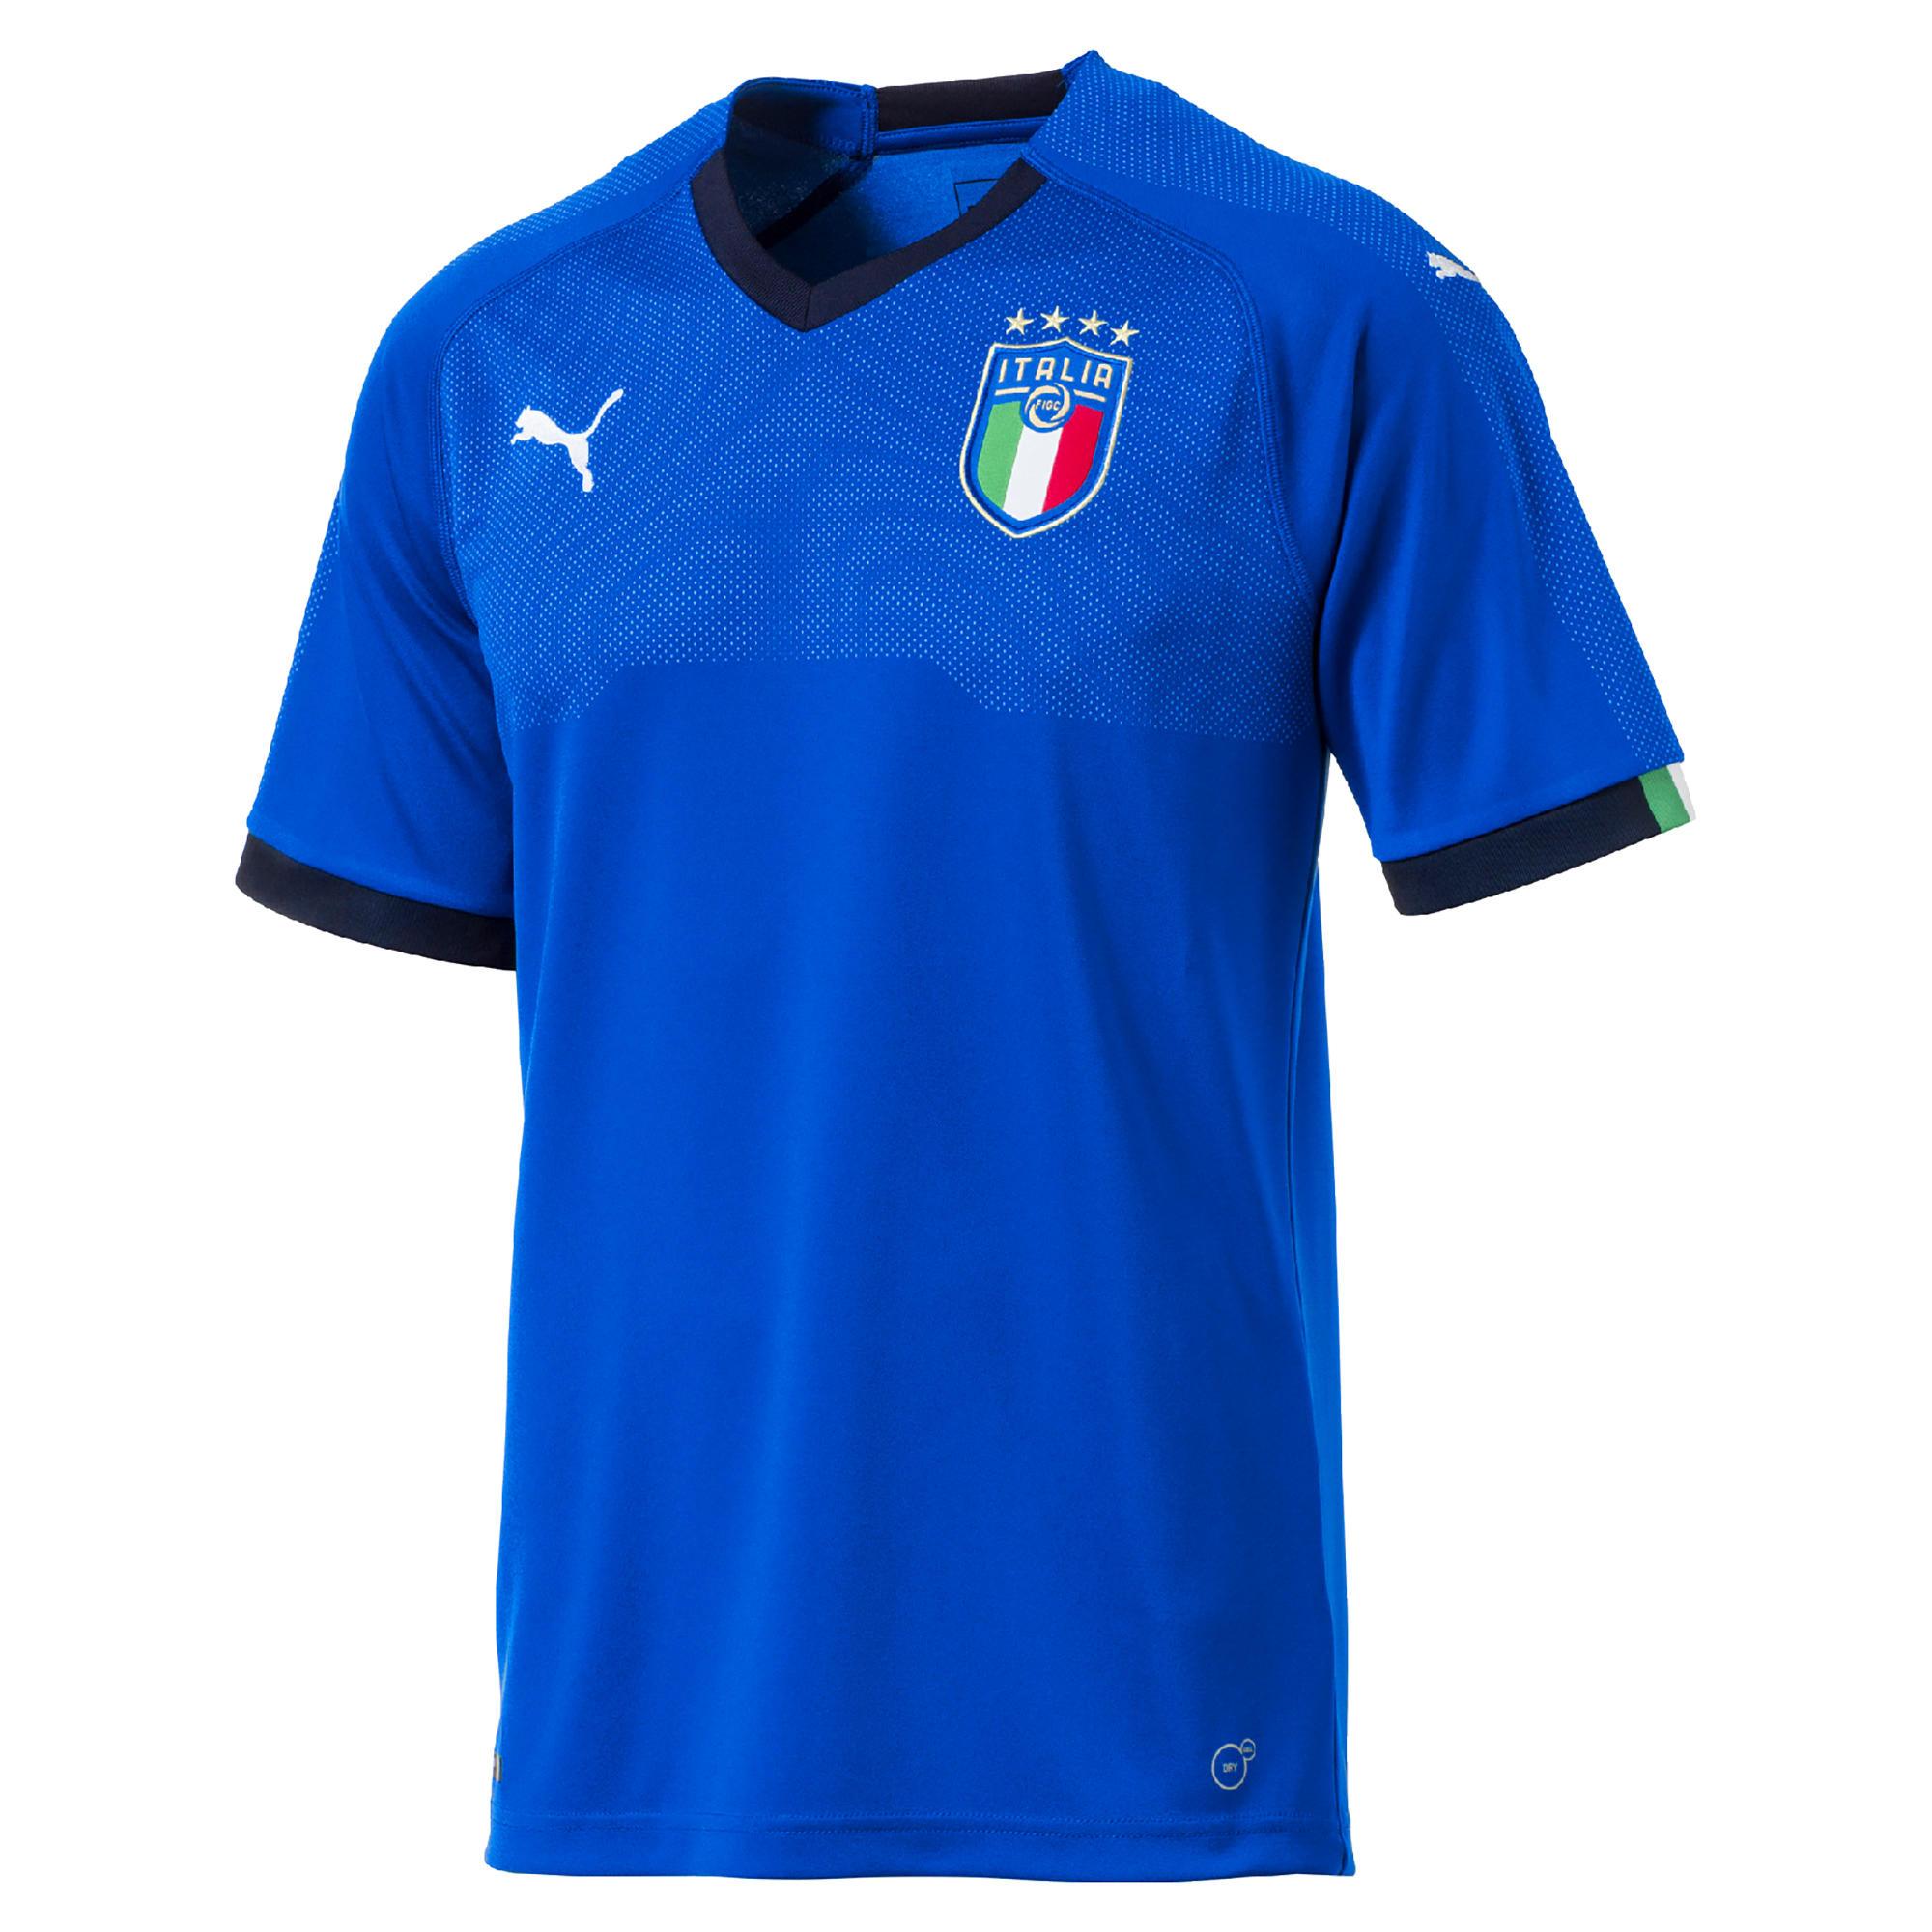 Puma Voetbalshirt Itali� thuisshirt 2018 voor volwassenen blauw